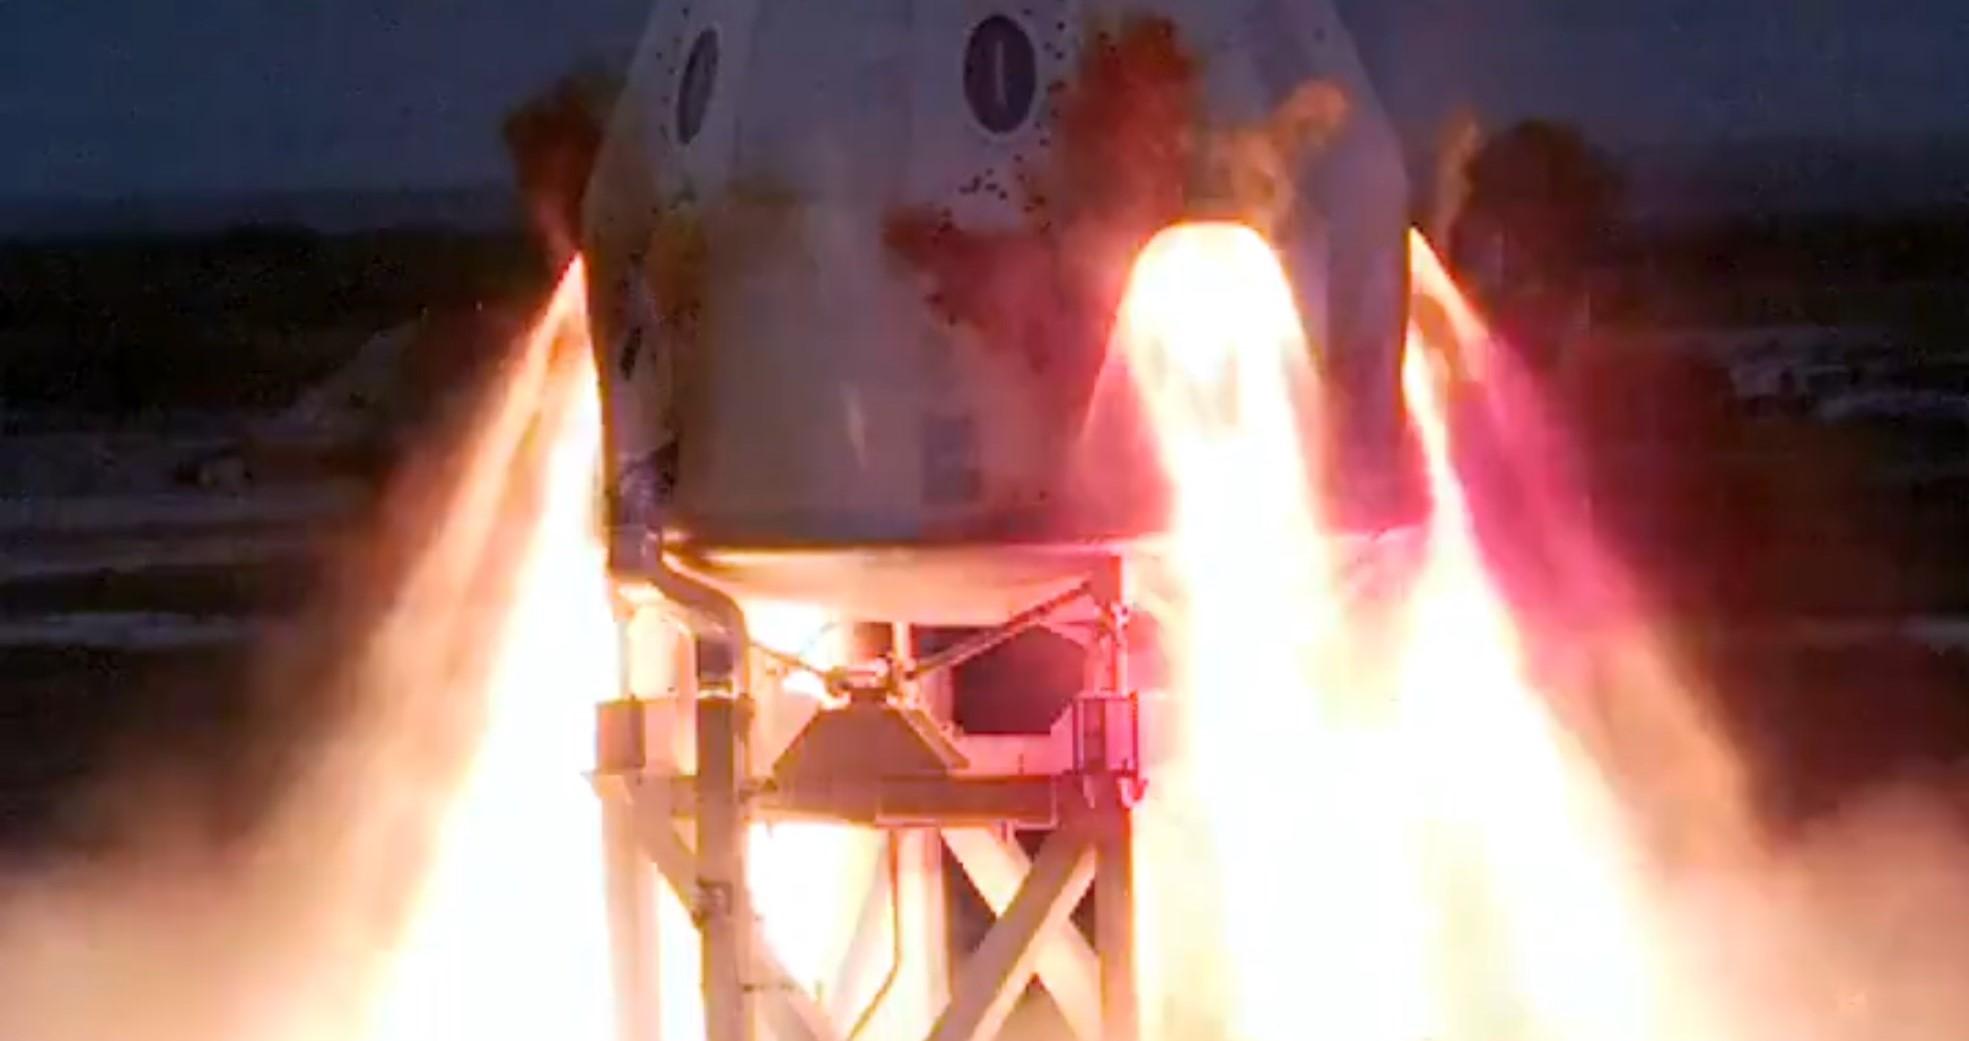 Crew Dragon C205 SuperDraco static fire 111319 (SpaceX) video 1 crop